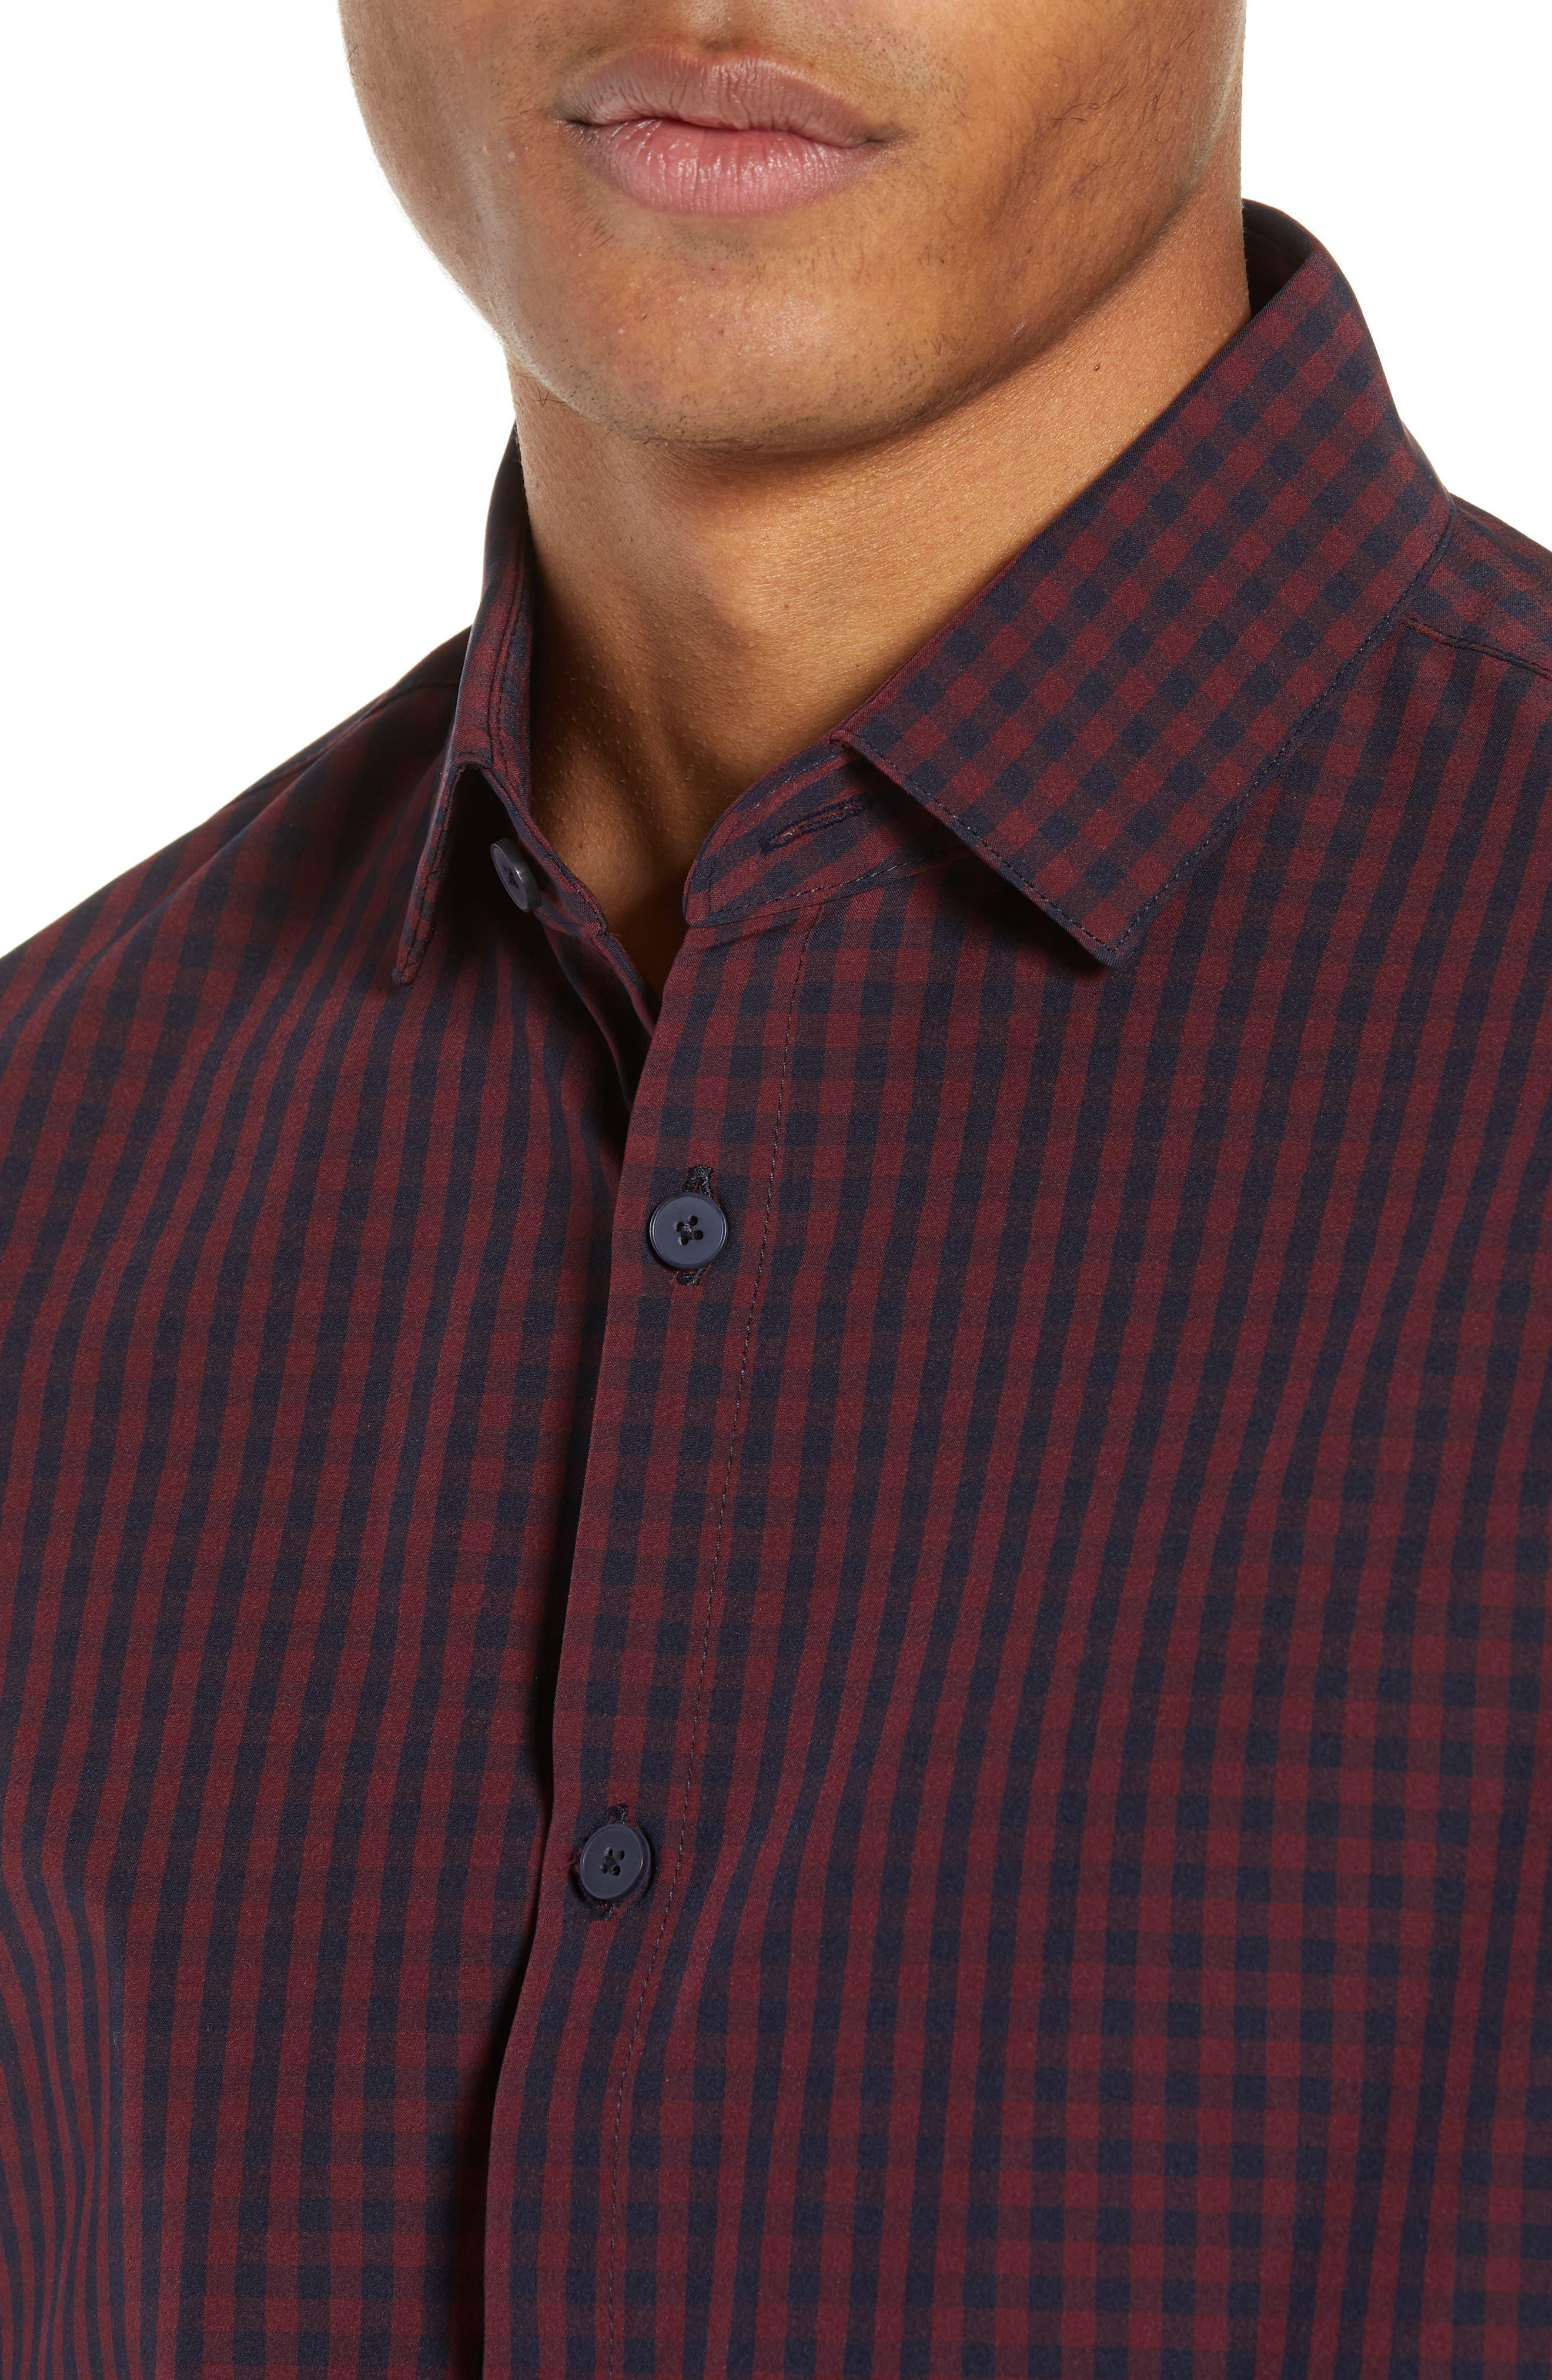 Marshall Check Sport Shirt,                             Alternate thumbnail 2, color,                             BURGUNDY